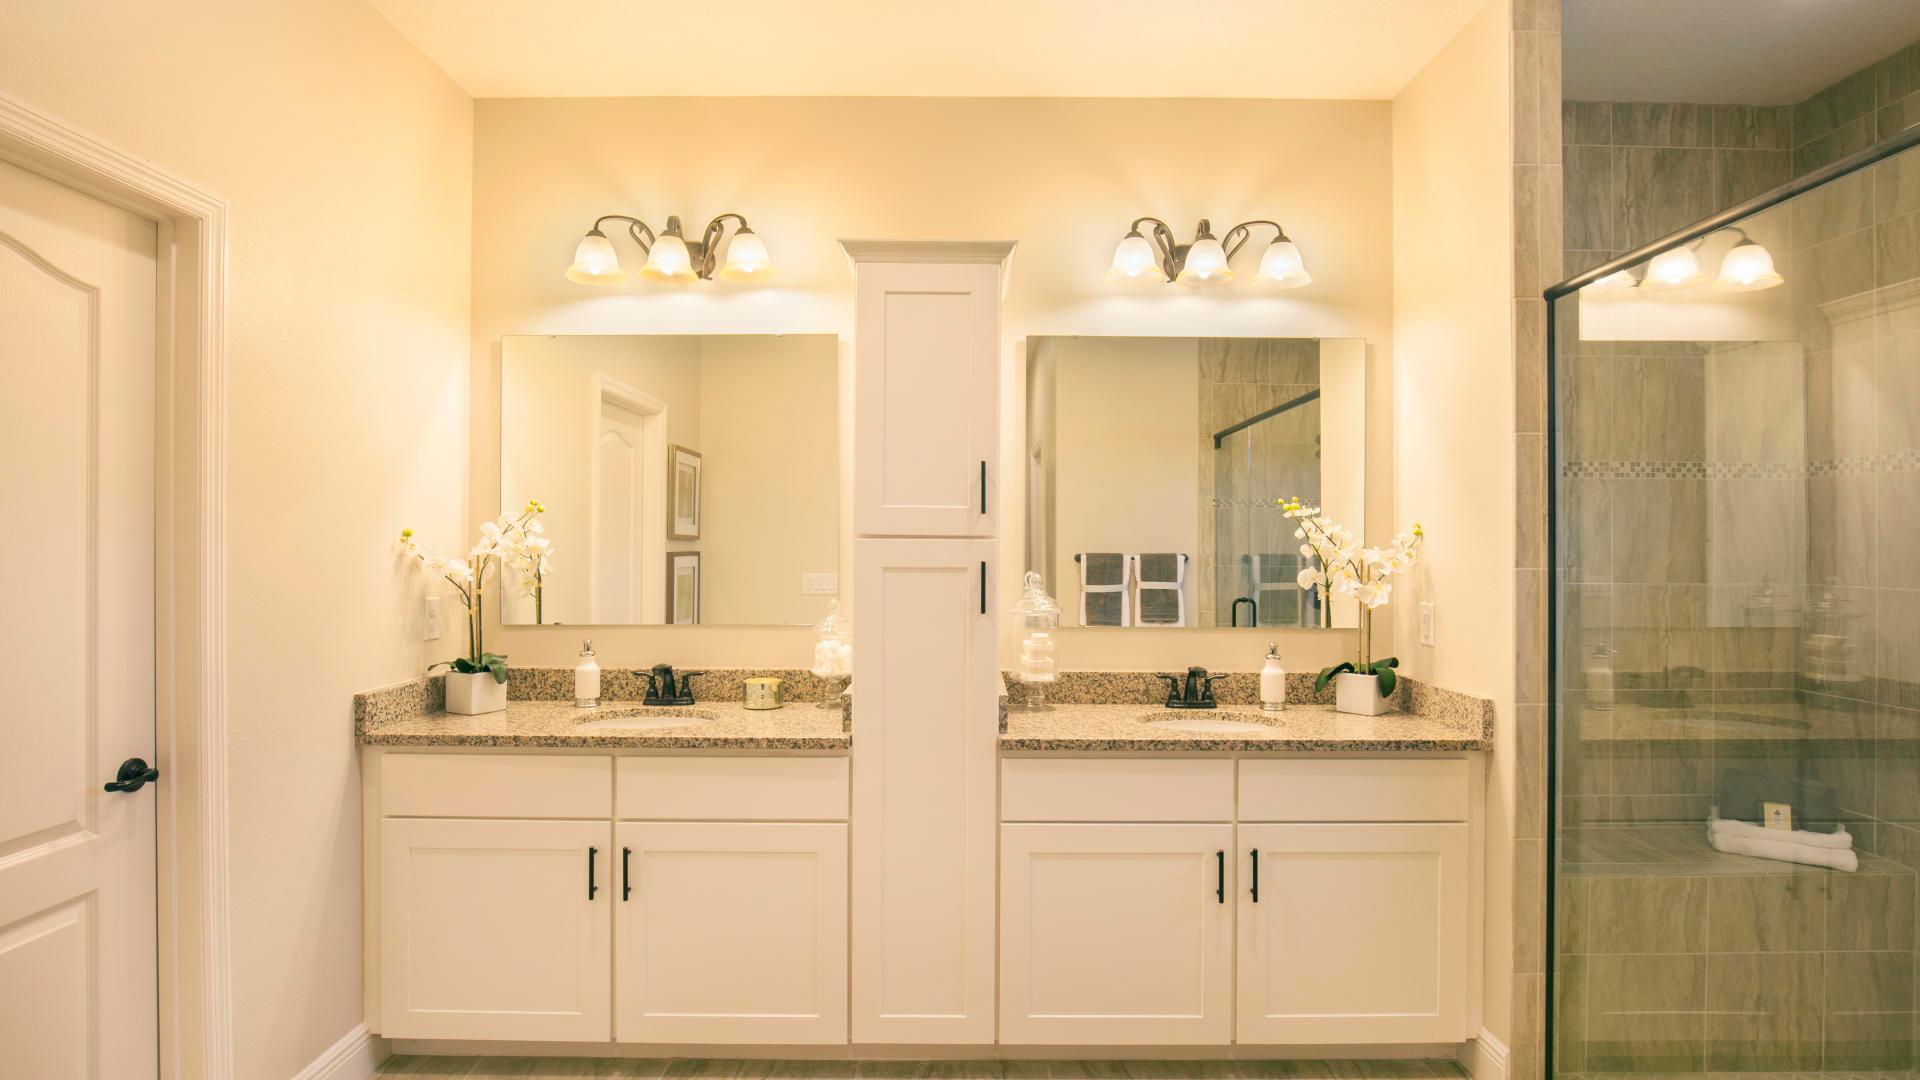 Bathroom featured in the Livorno By Maronda Homes in Daytona Beach, FL